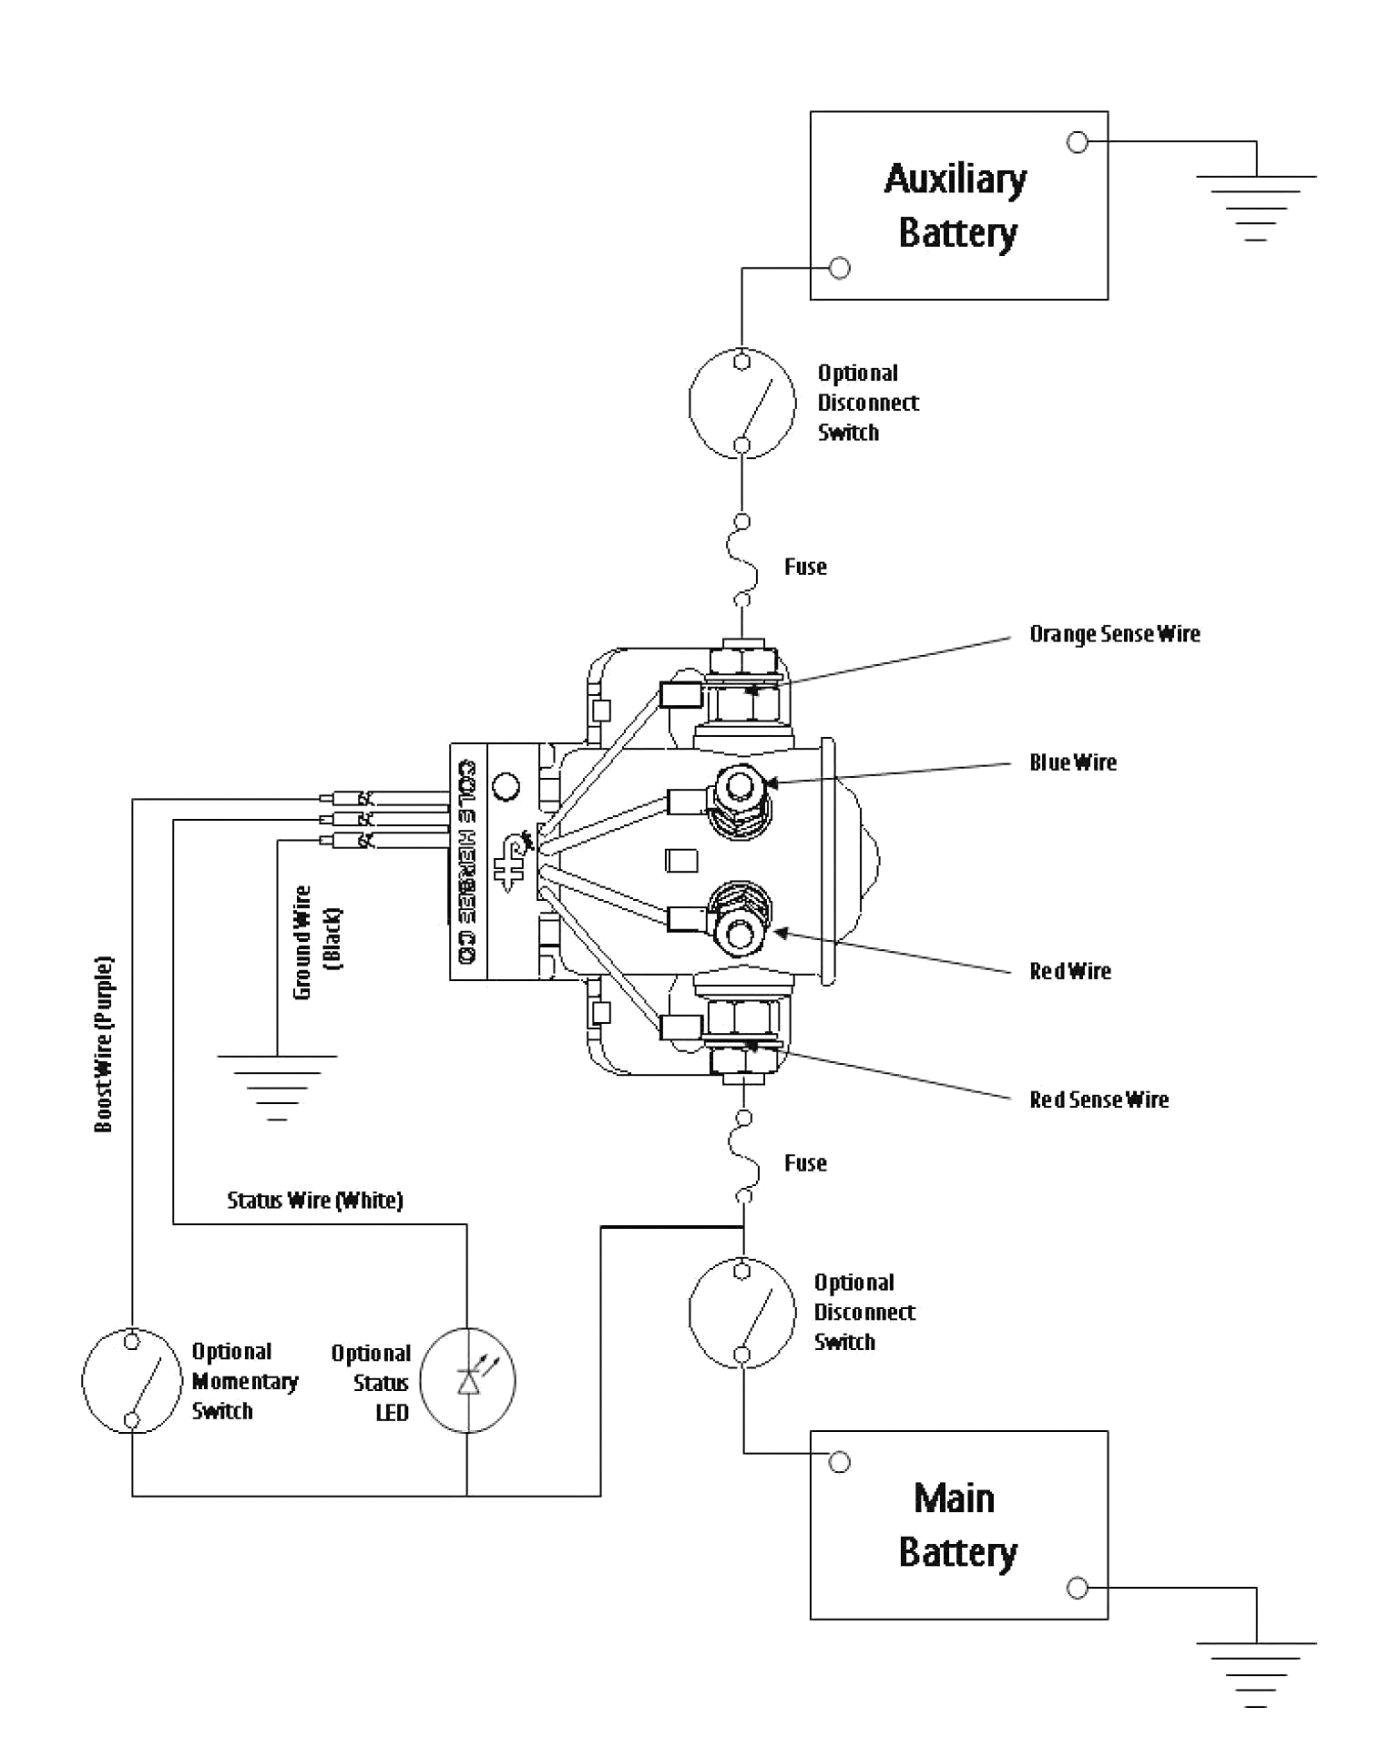 Redarc Battery isolator Wiring Diagram Rv Dual Battery Switch Wiring Diagram Wiring Diagram Expert